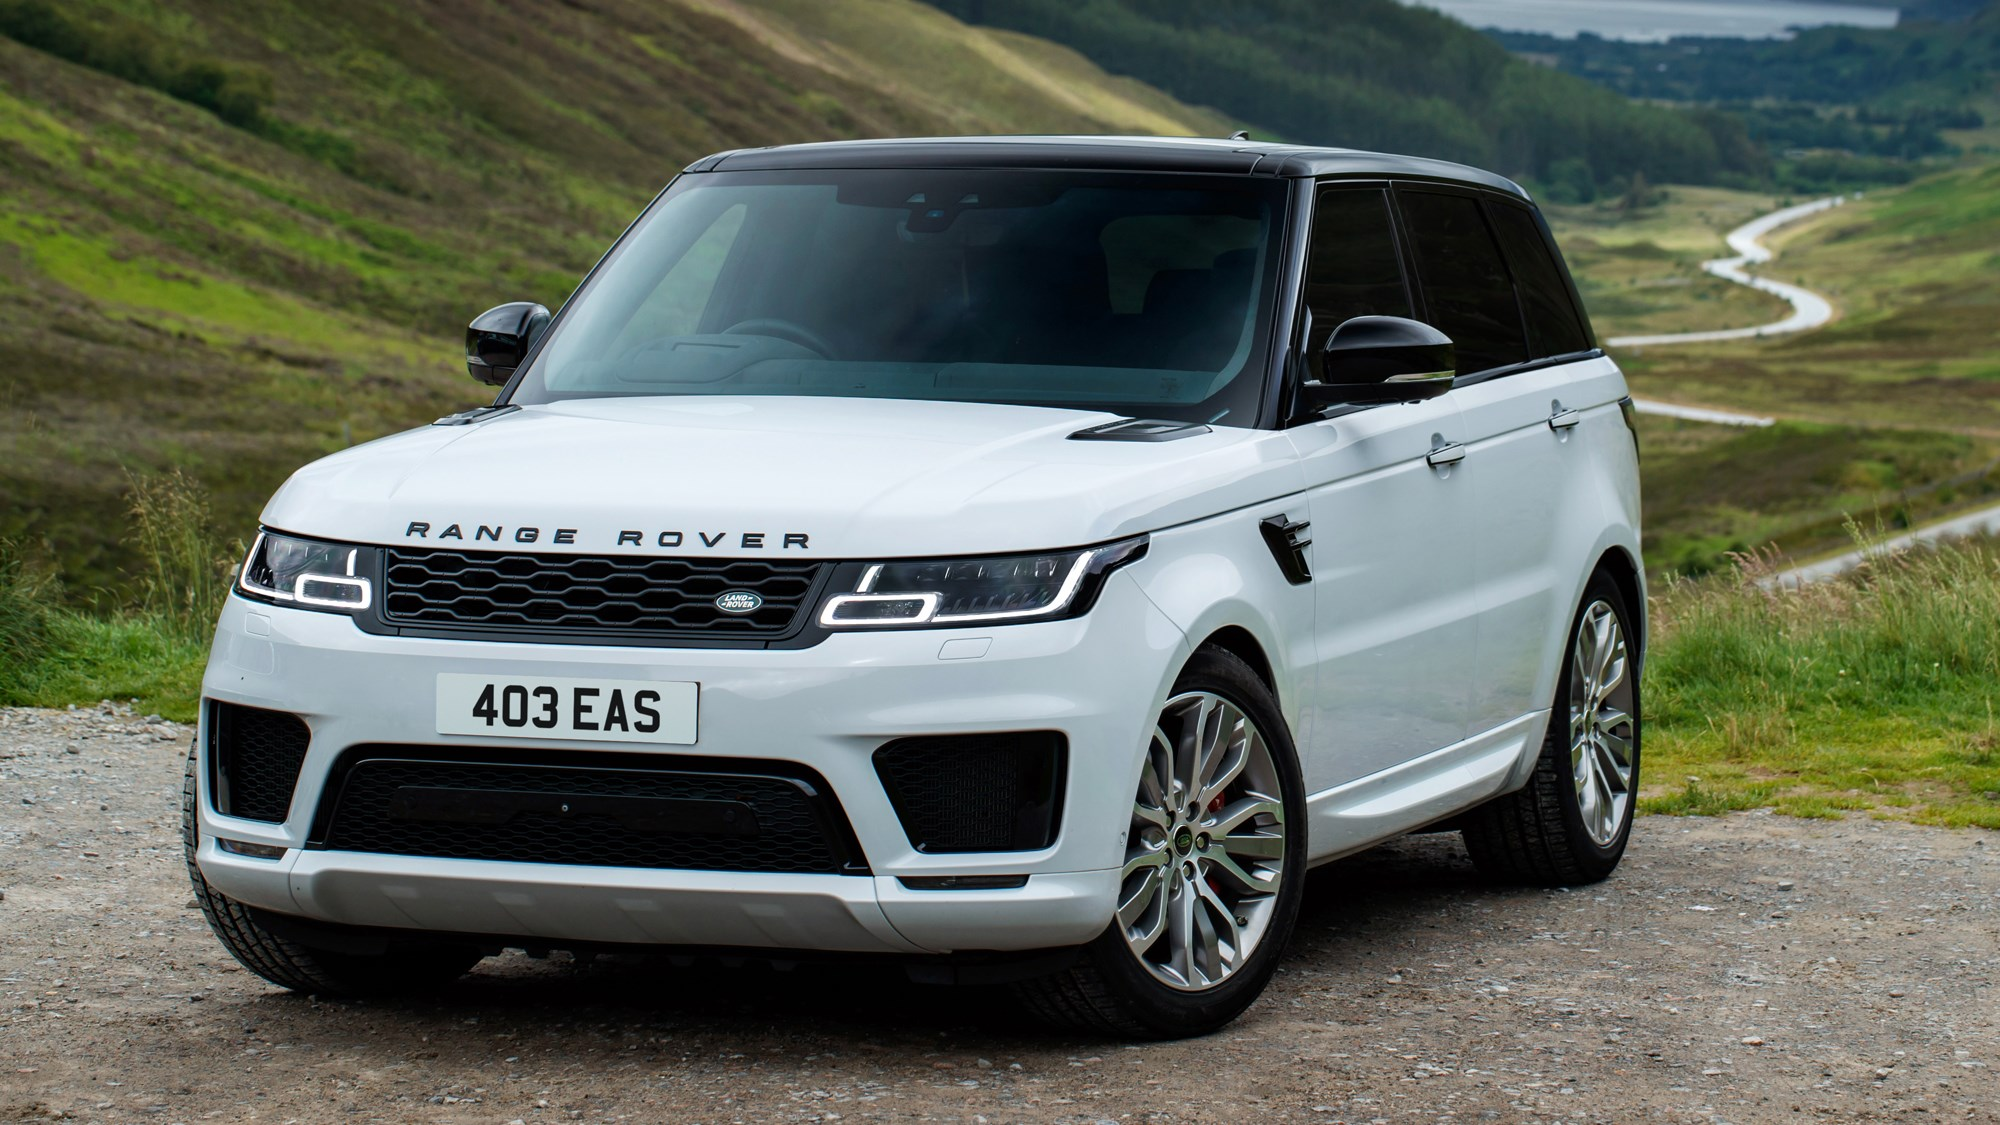 White Land Rover Range Rover Sport D350 front three-quarter